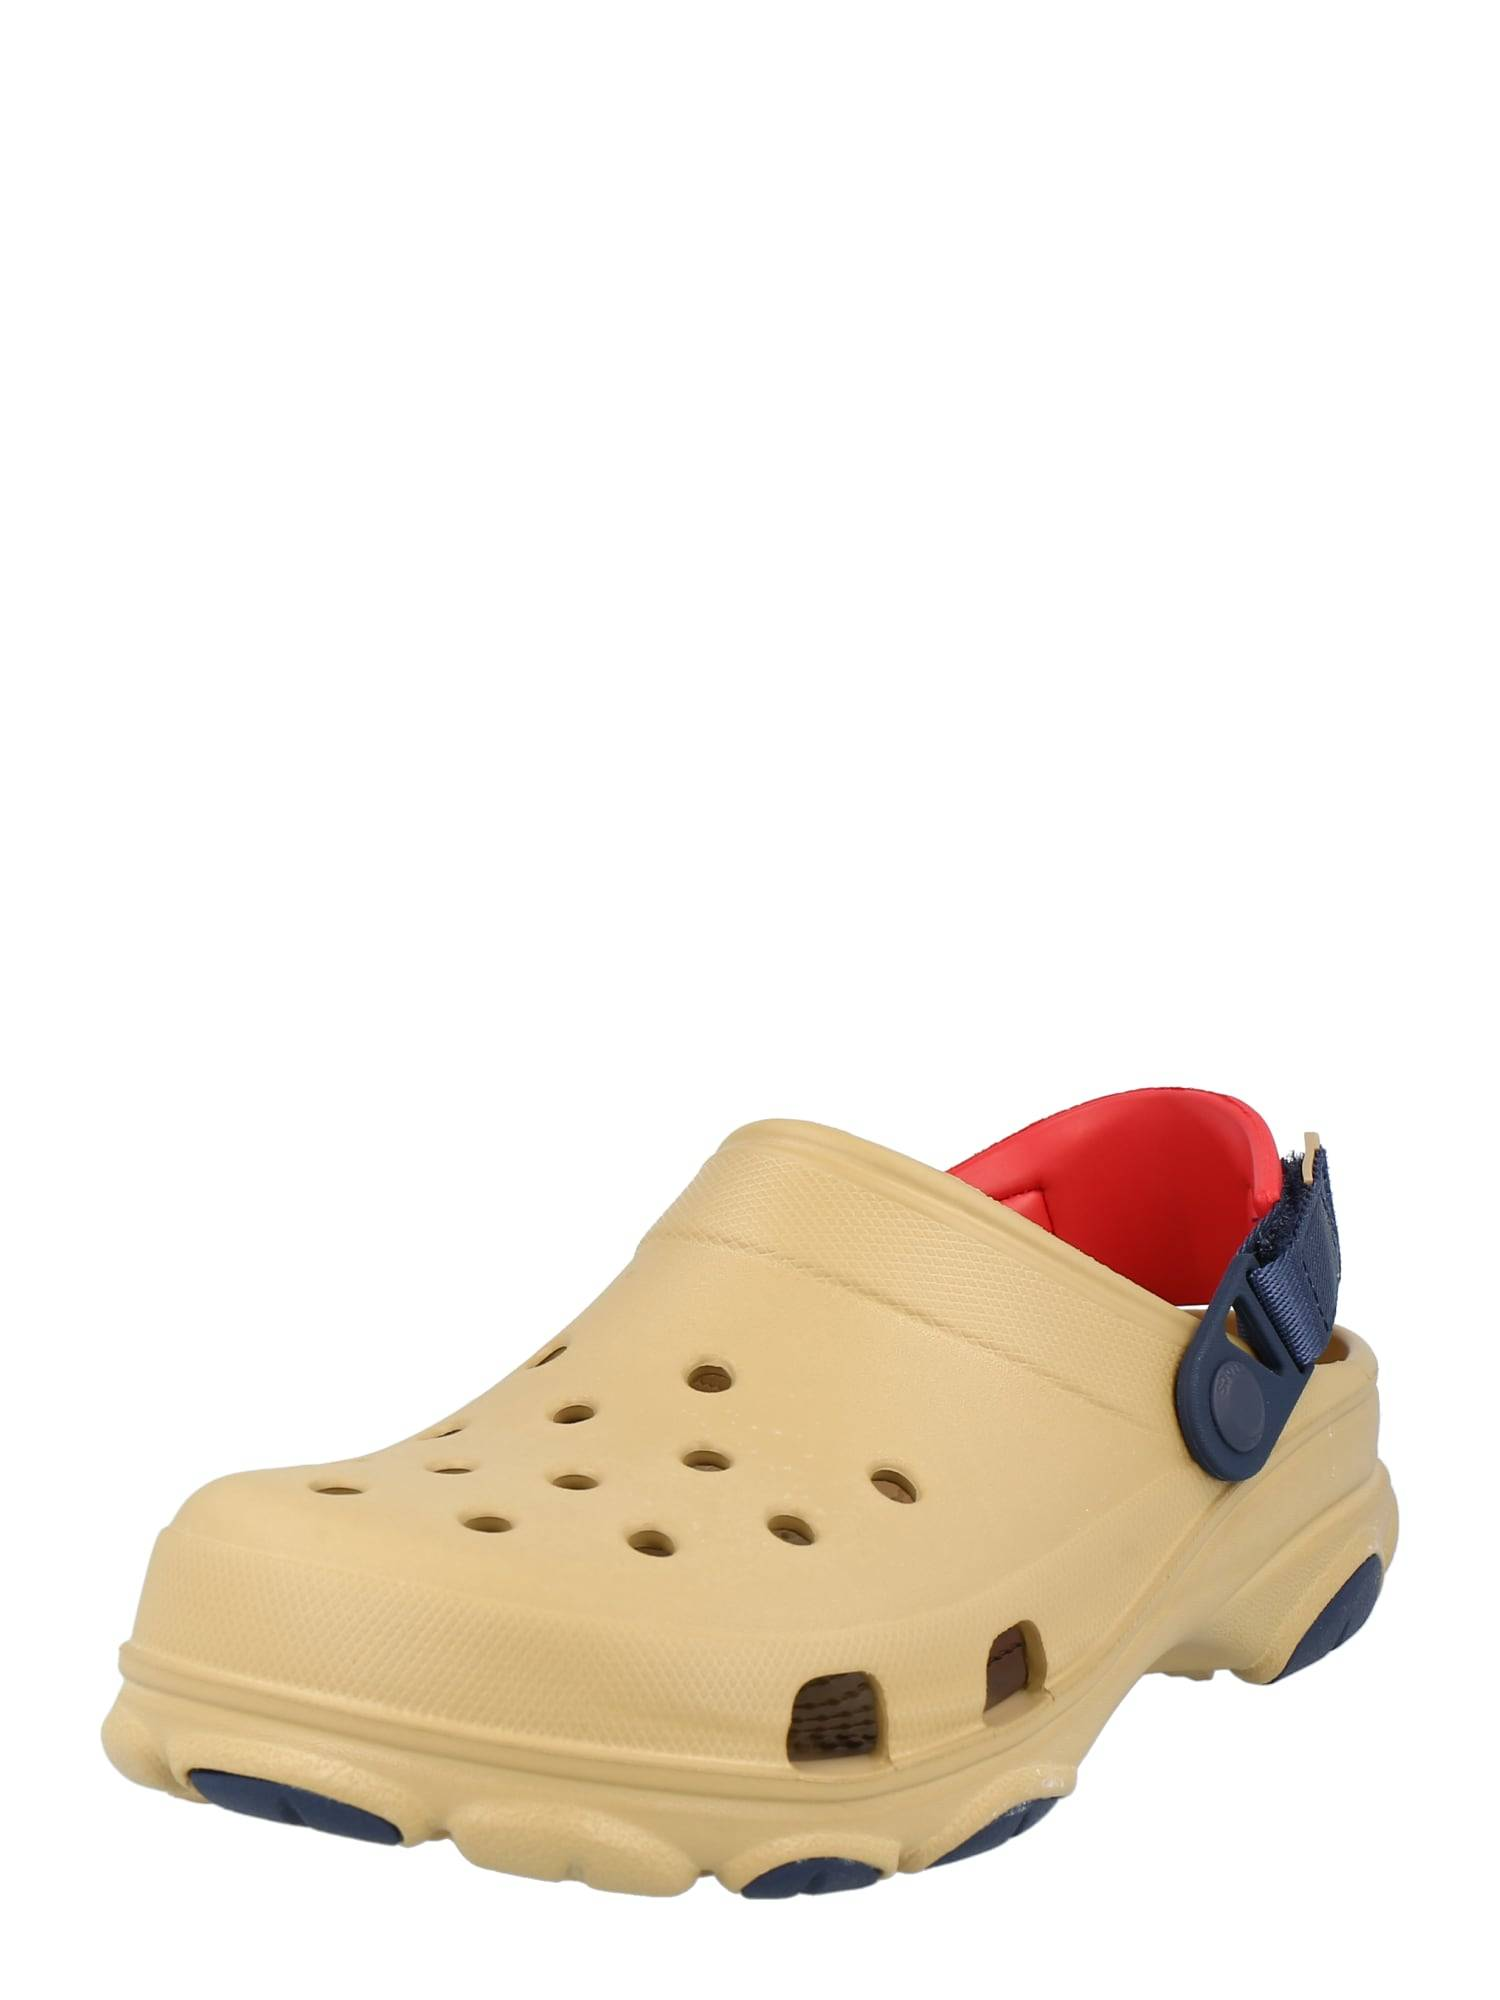 Crocs Sabots 'All Terrain'  - Marron - Taille: M4W6 - male